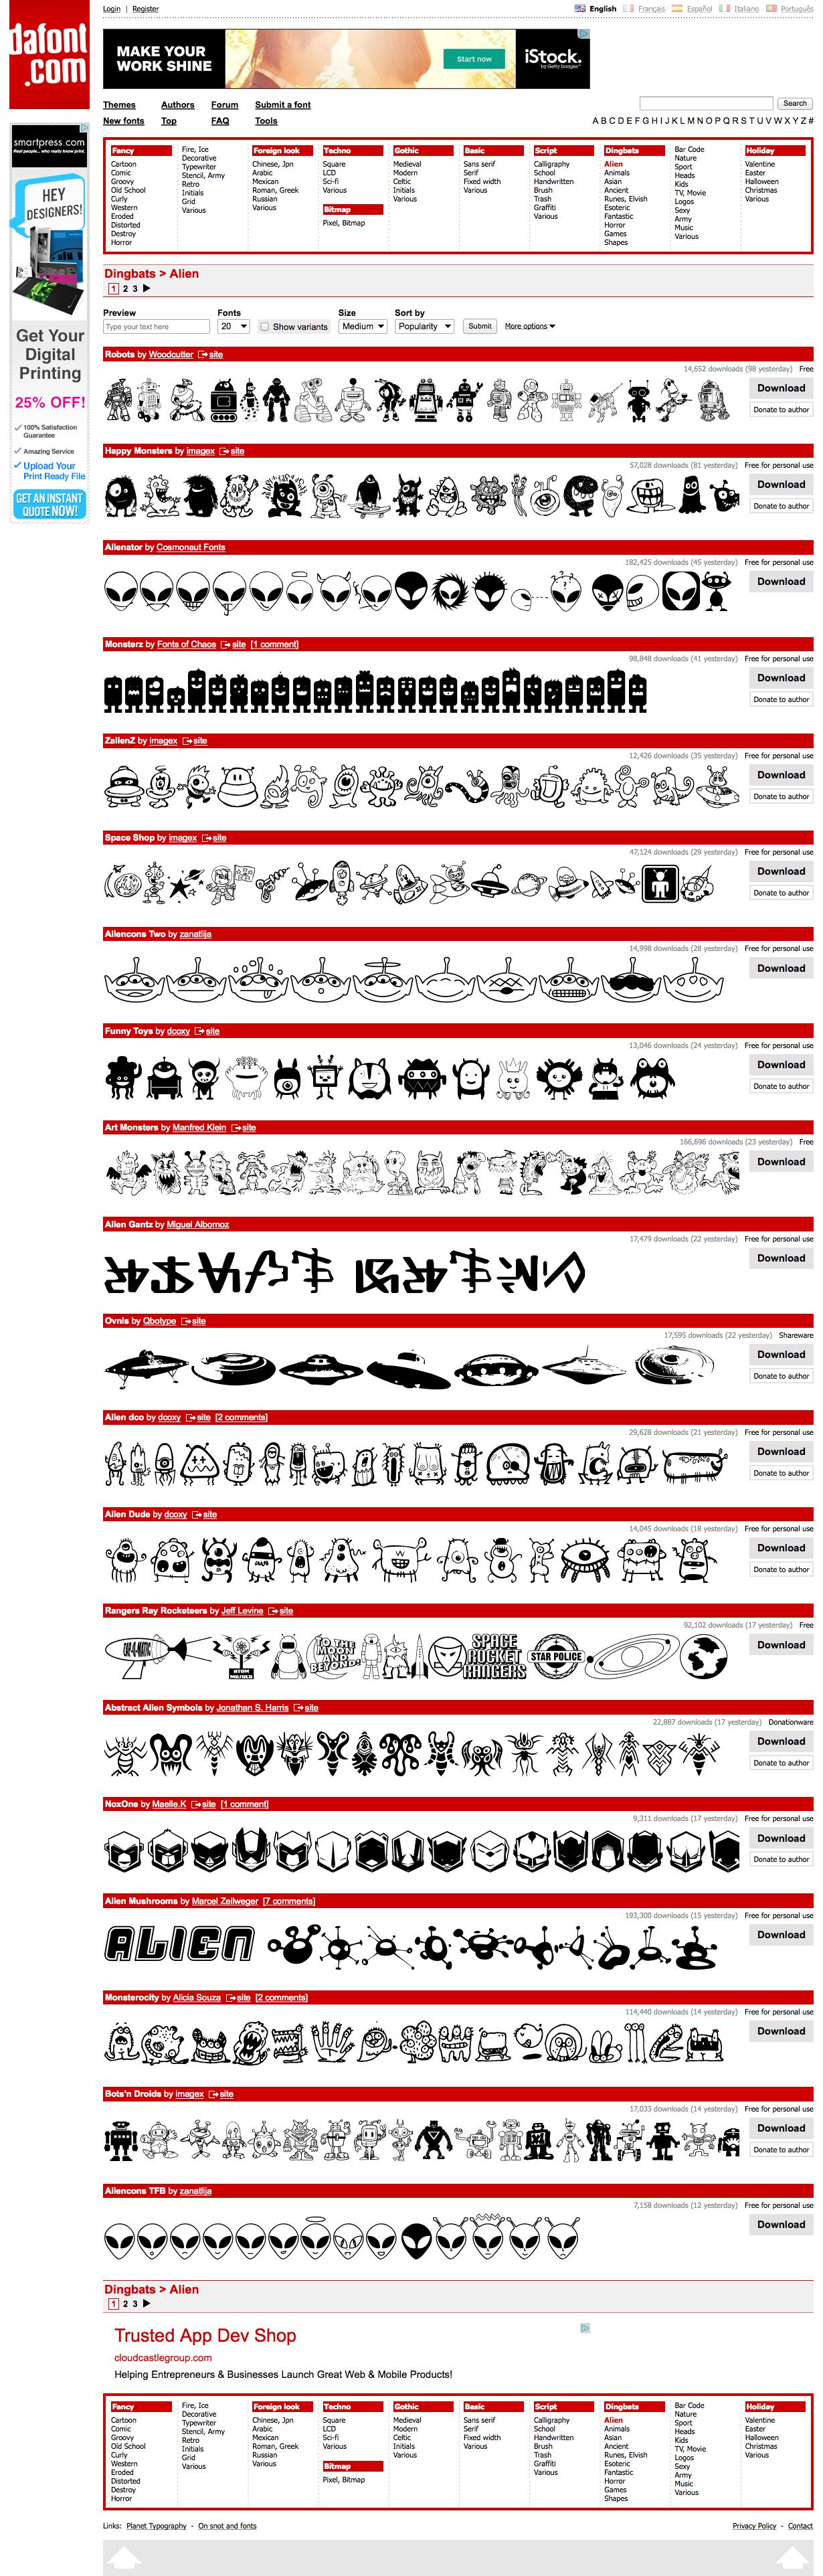 Alien fonts! Free! from dafont.com